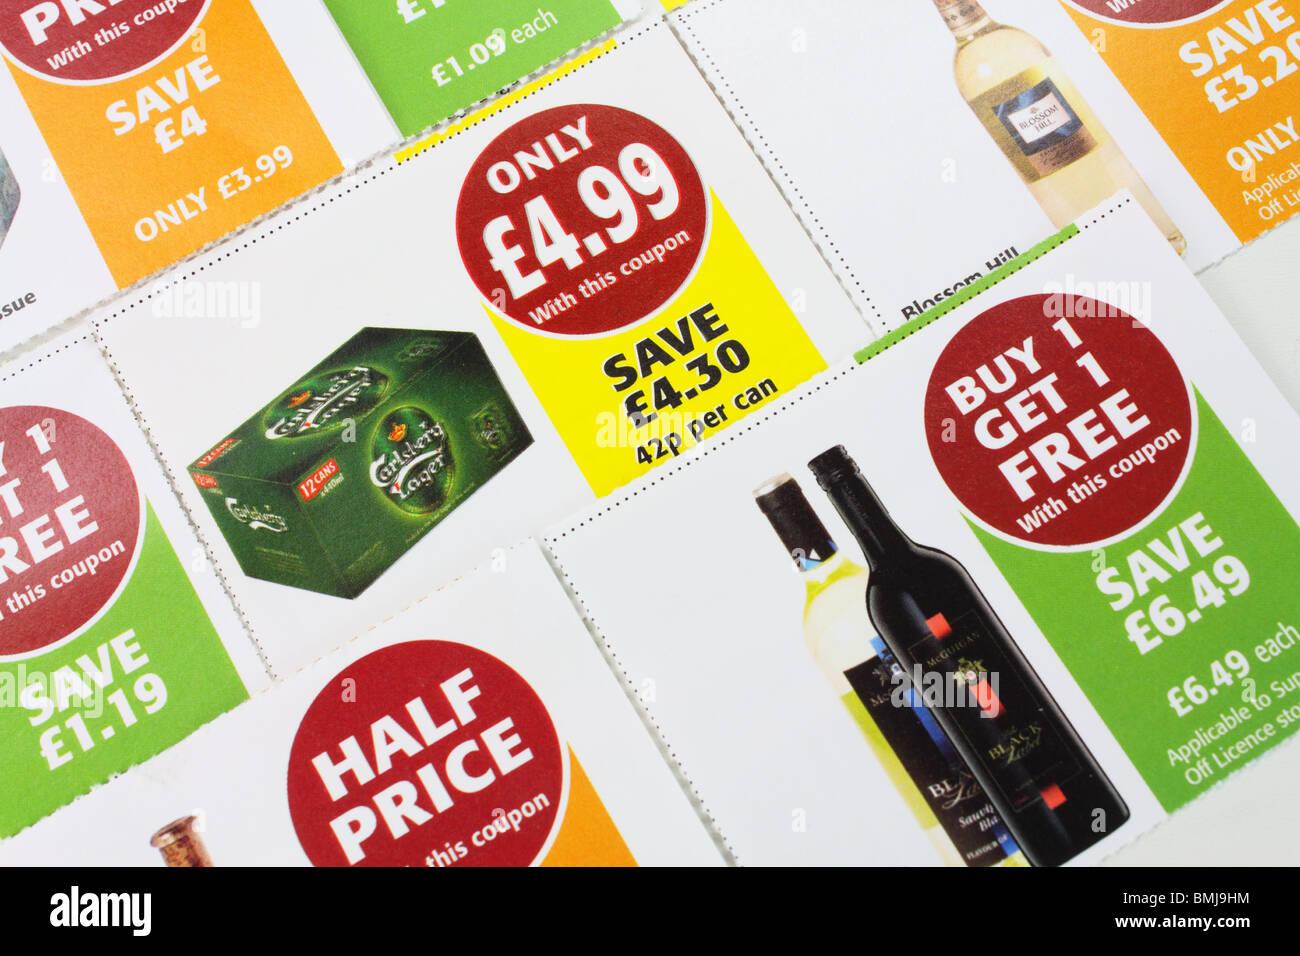 drinks promotion money saving coupons - Stock Image